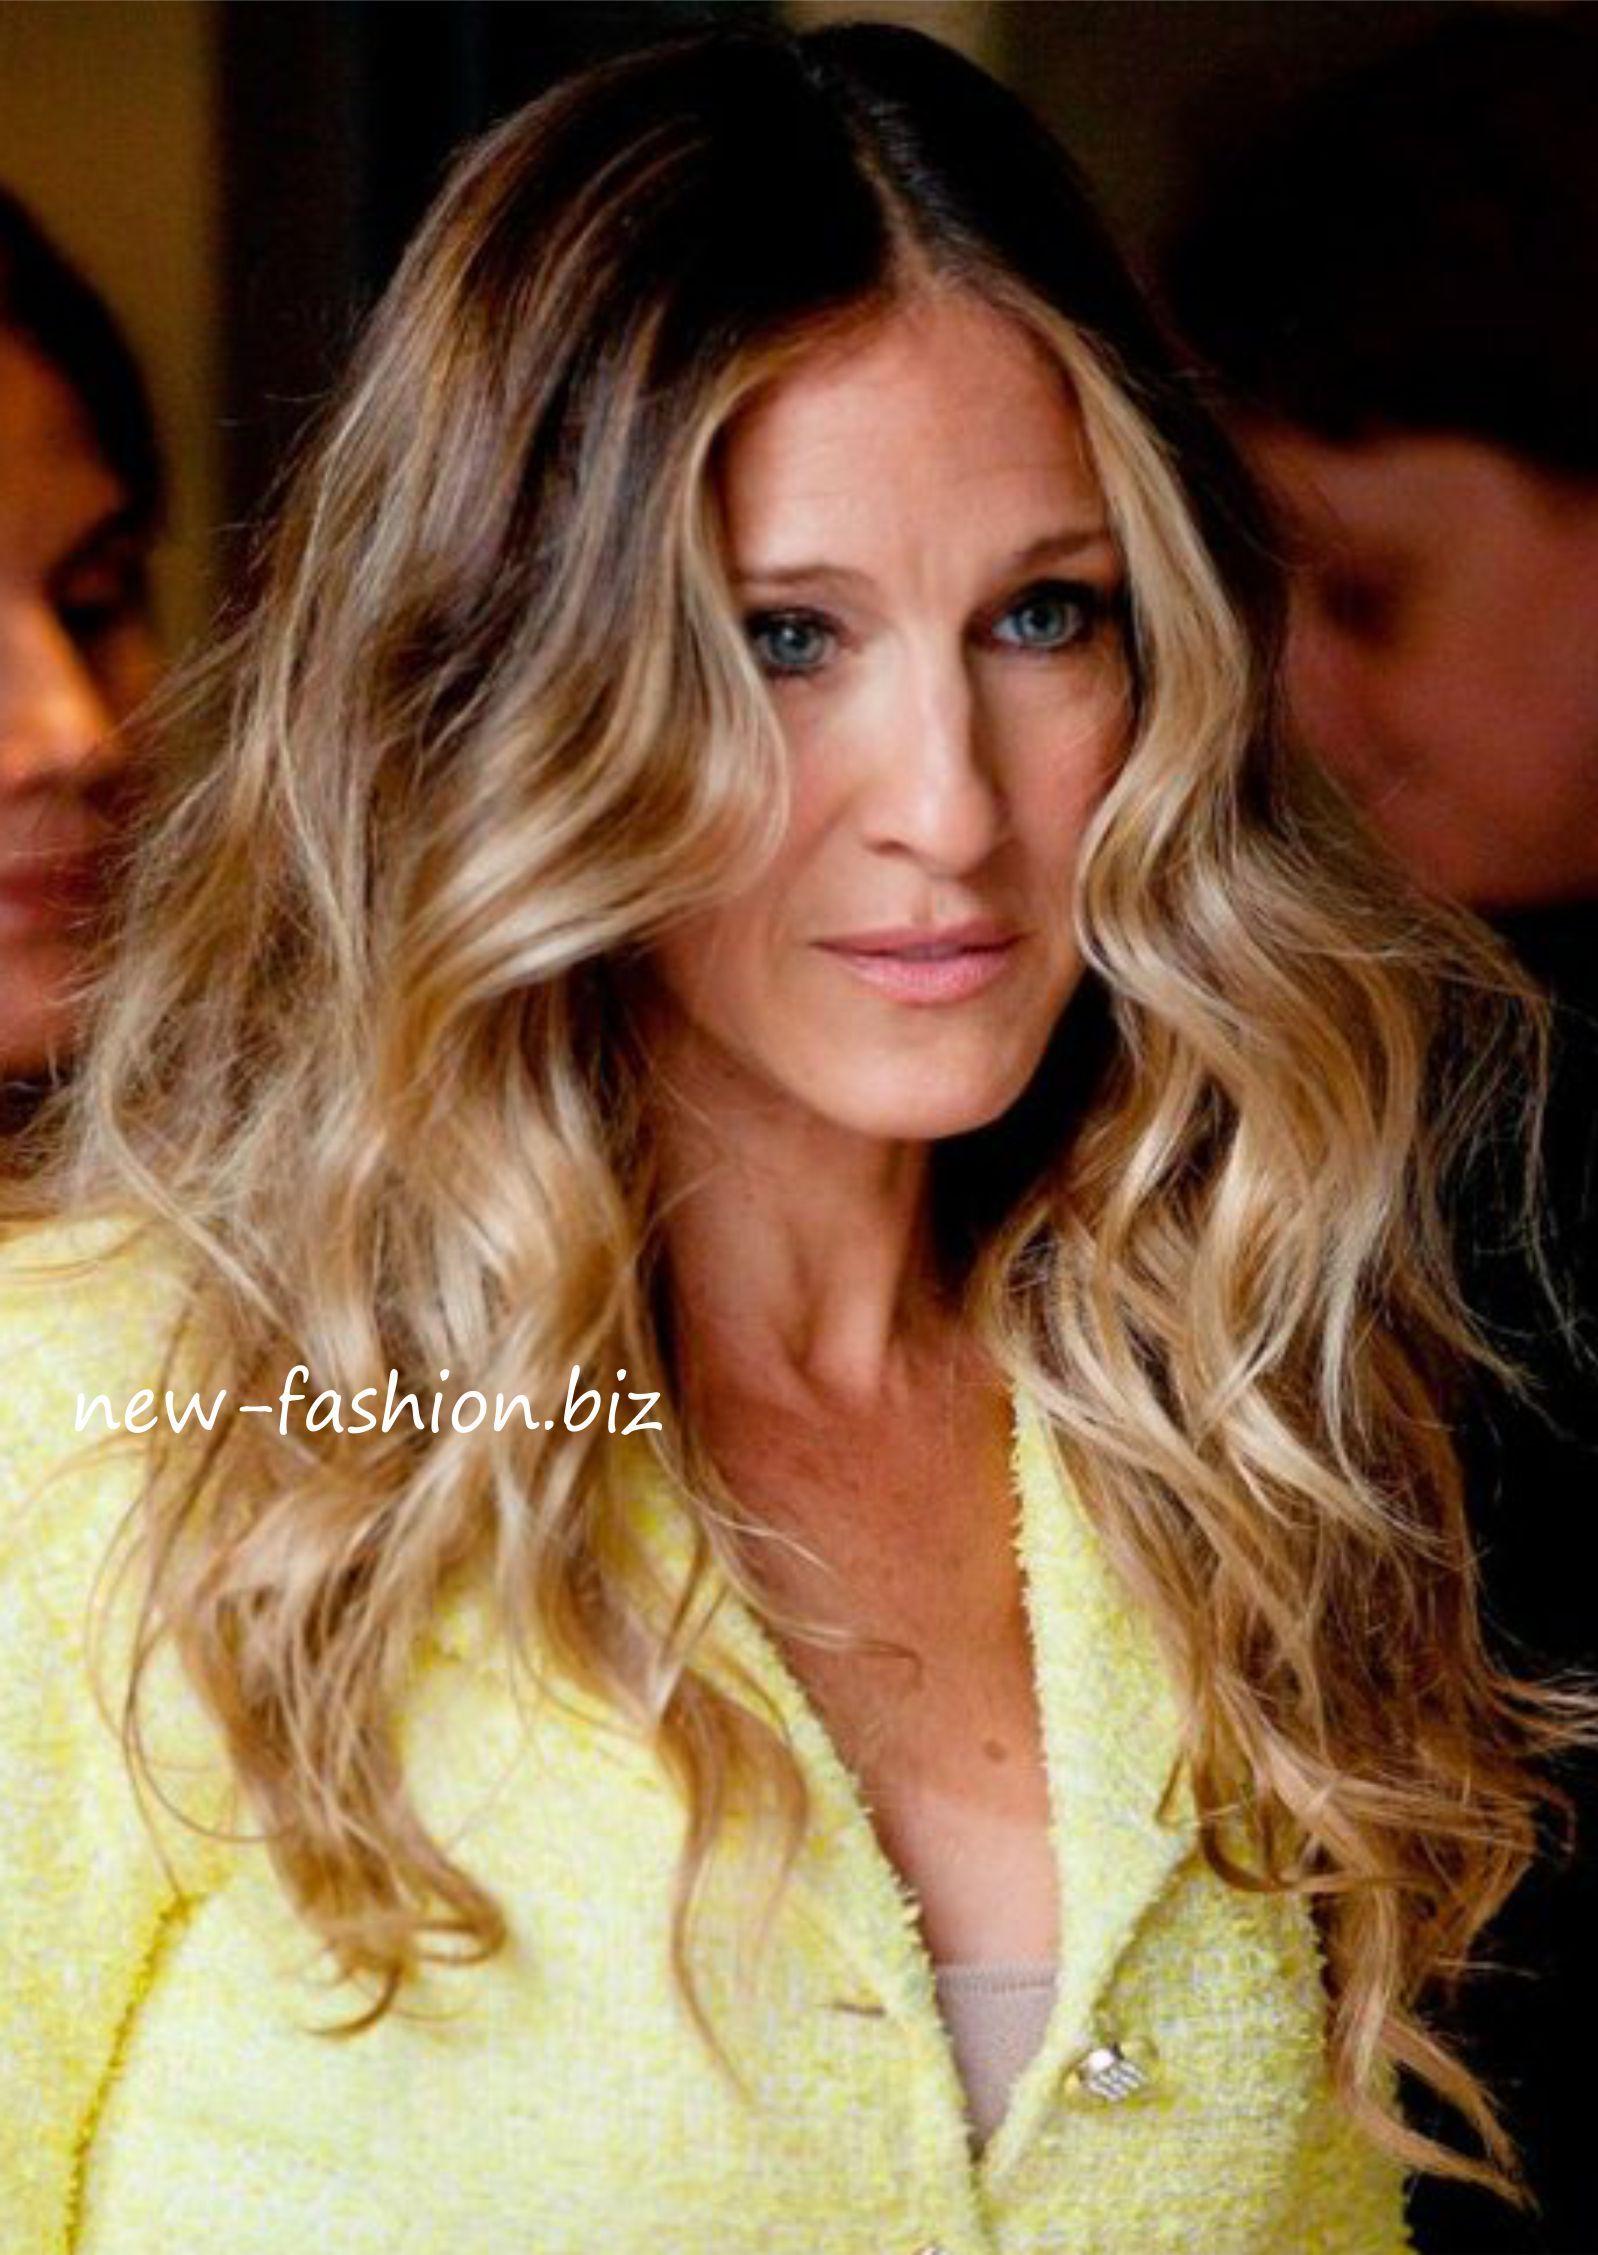 sarah jessica parker | dream hair in 2019 | hair styles